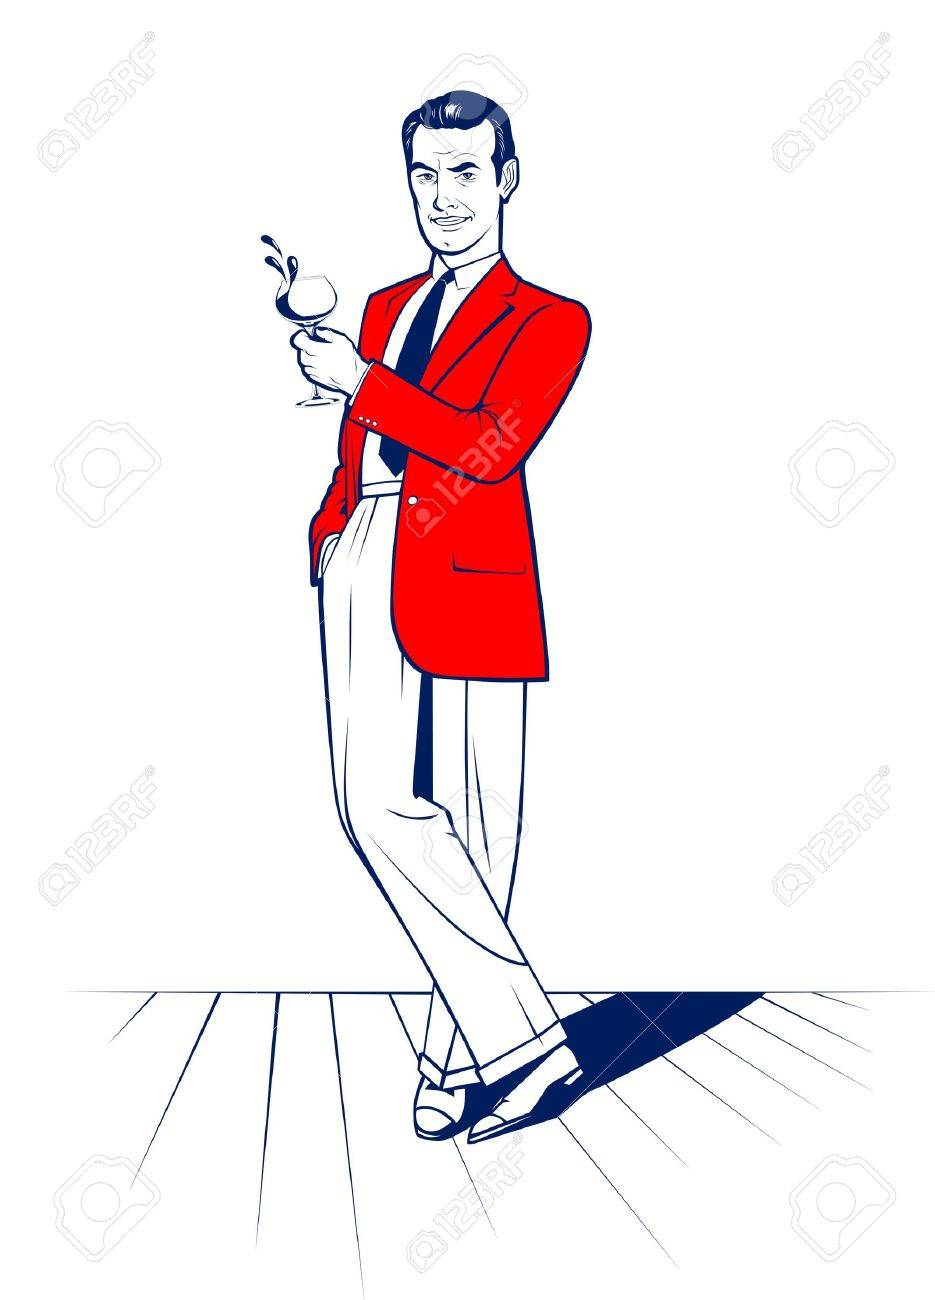 cartoon style cocktail drink man - 11308518